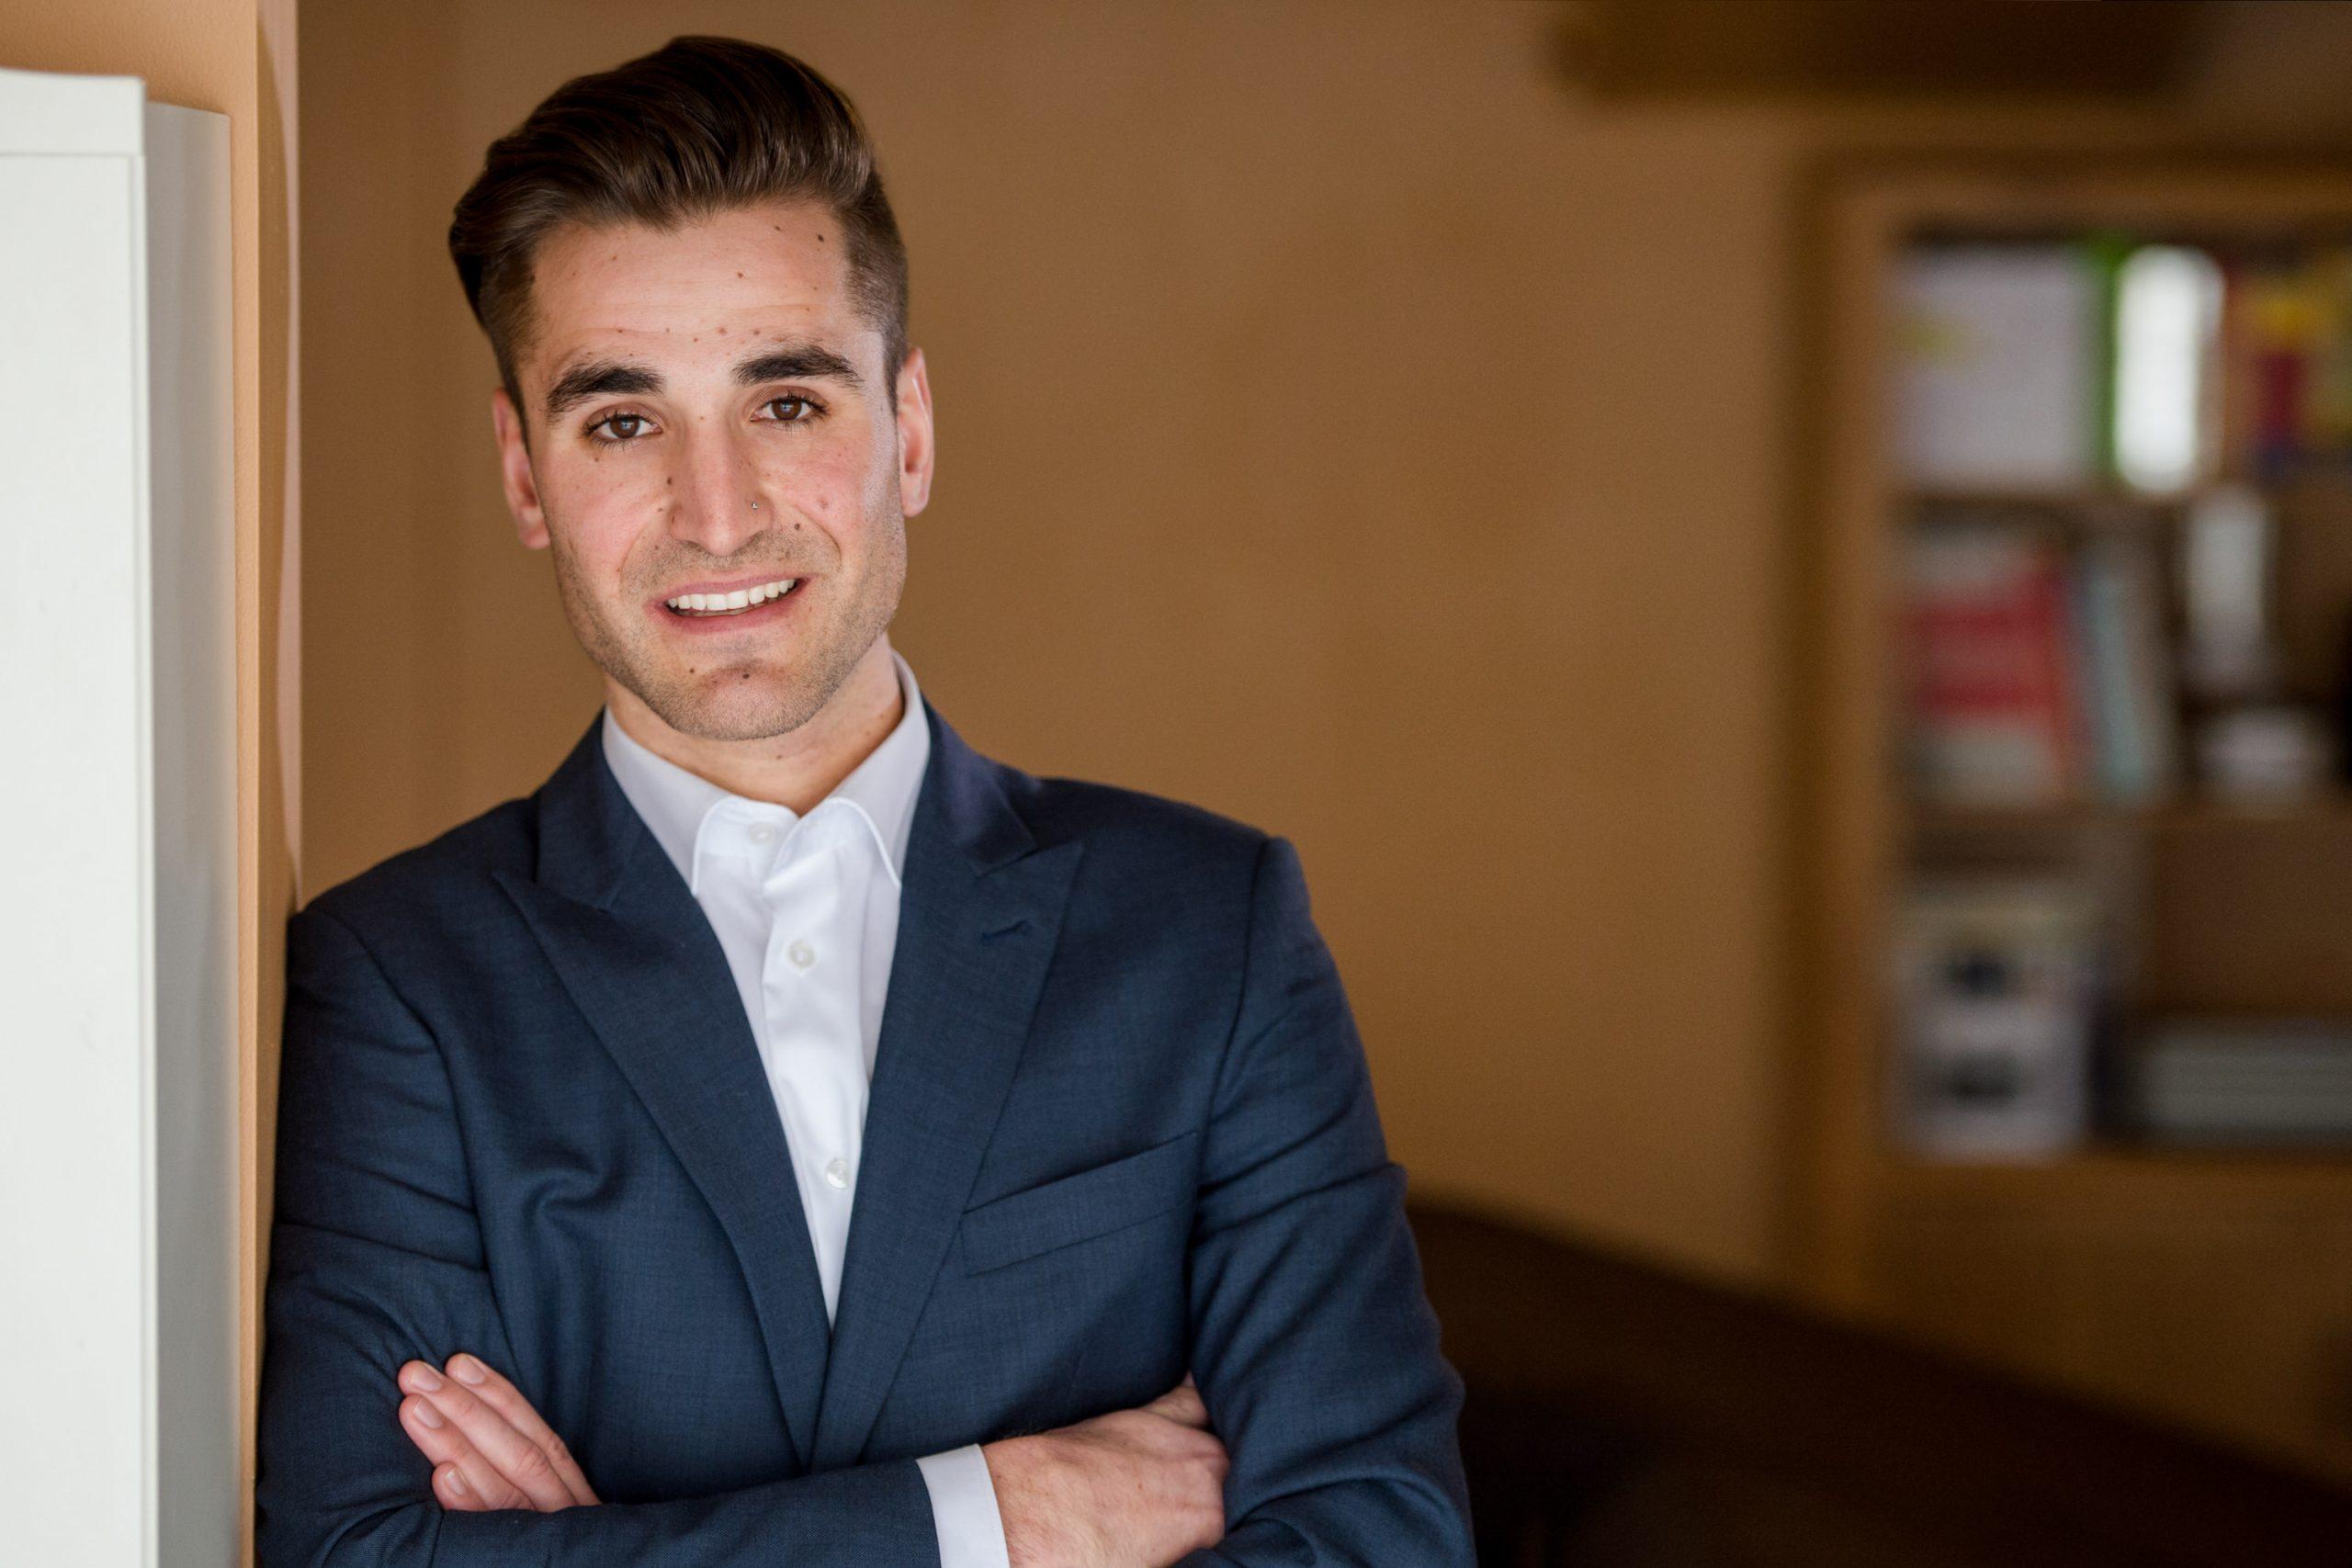 Kamloops headshot photographer for entrepreneurs and business man